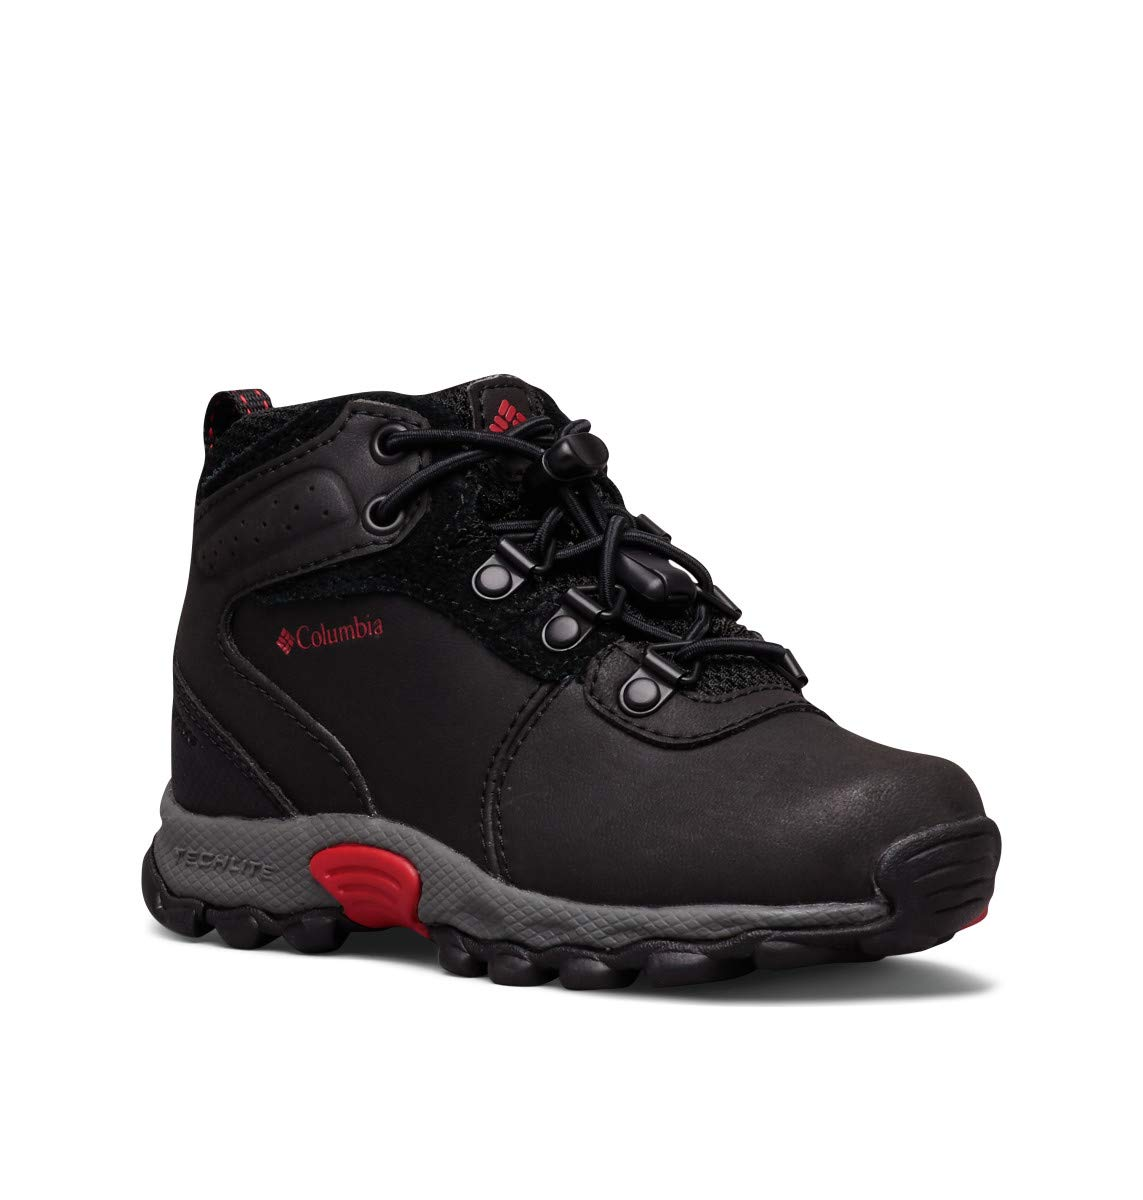 Columbia Unisex-Kid's Youth Newton Ridge Hiking Shoe, Black/Mountain Red, 3